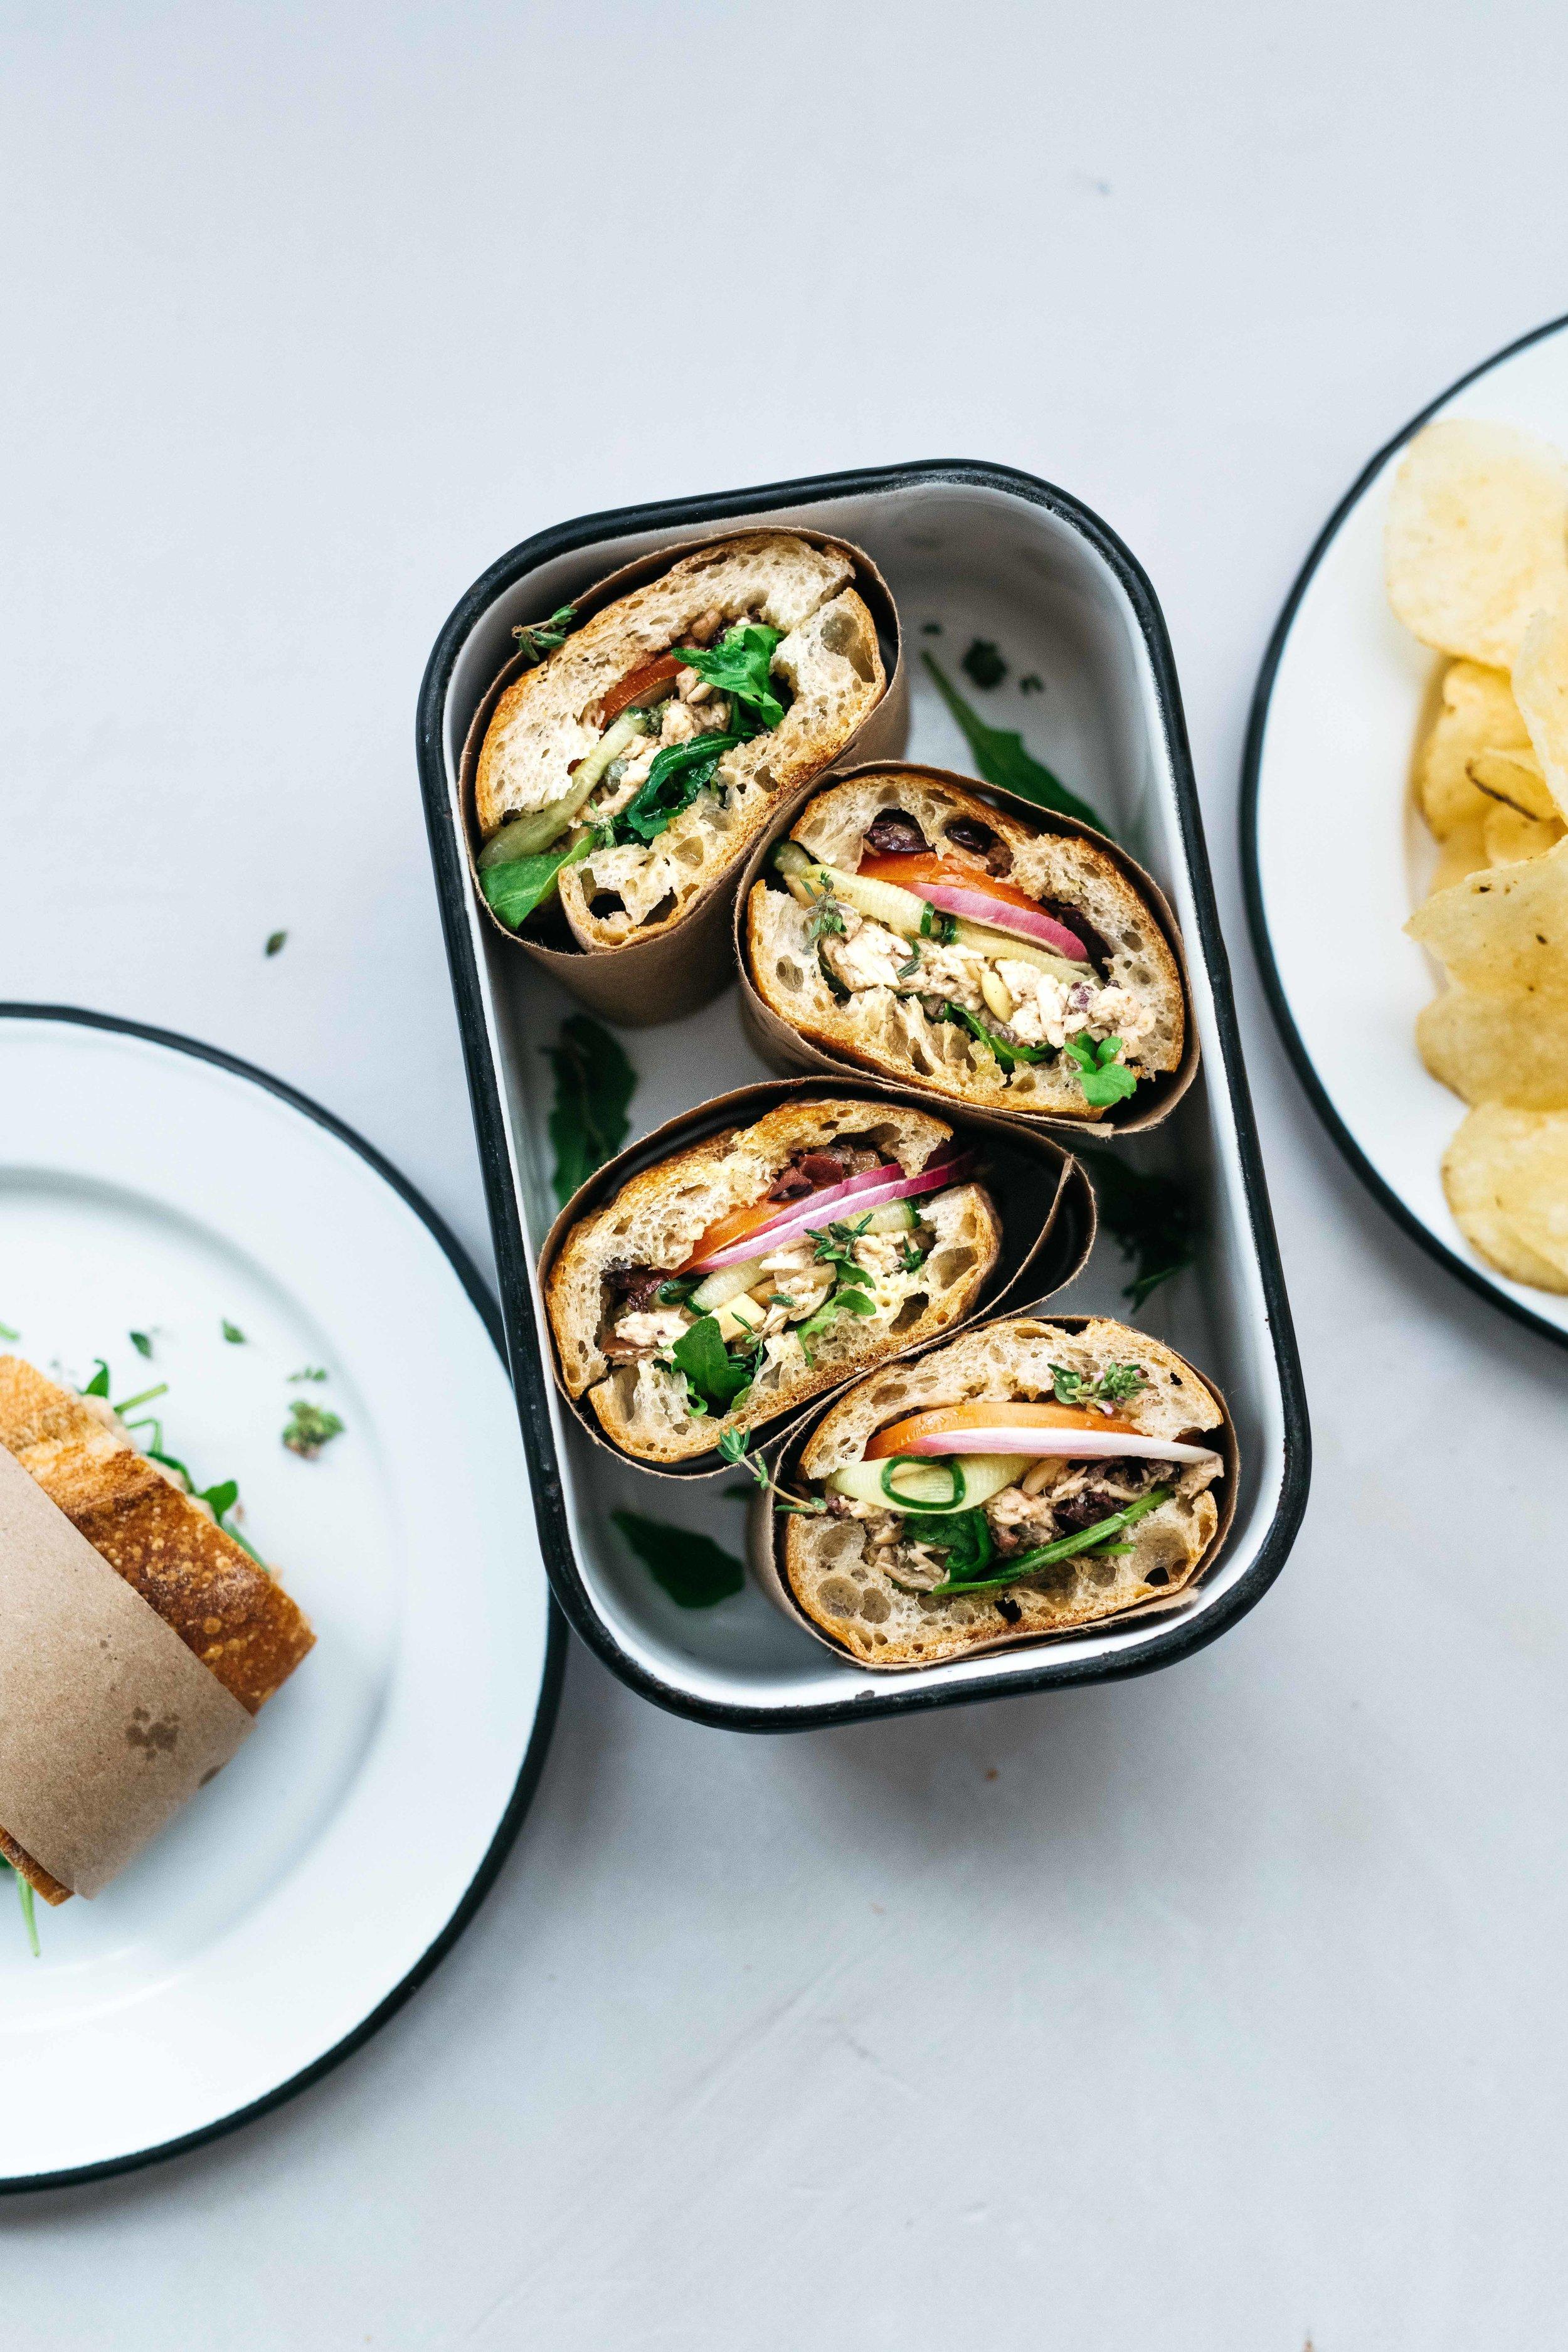 BEACH-READY NIÇOISE SANDWICH (AKA PAN BAGNAT)